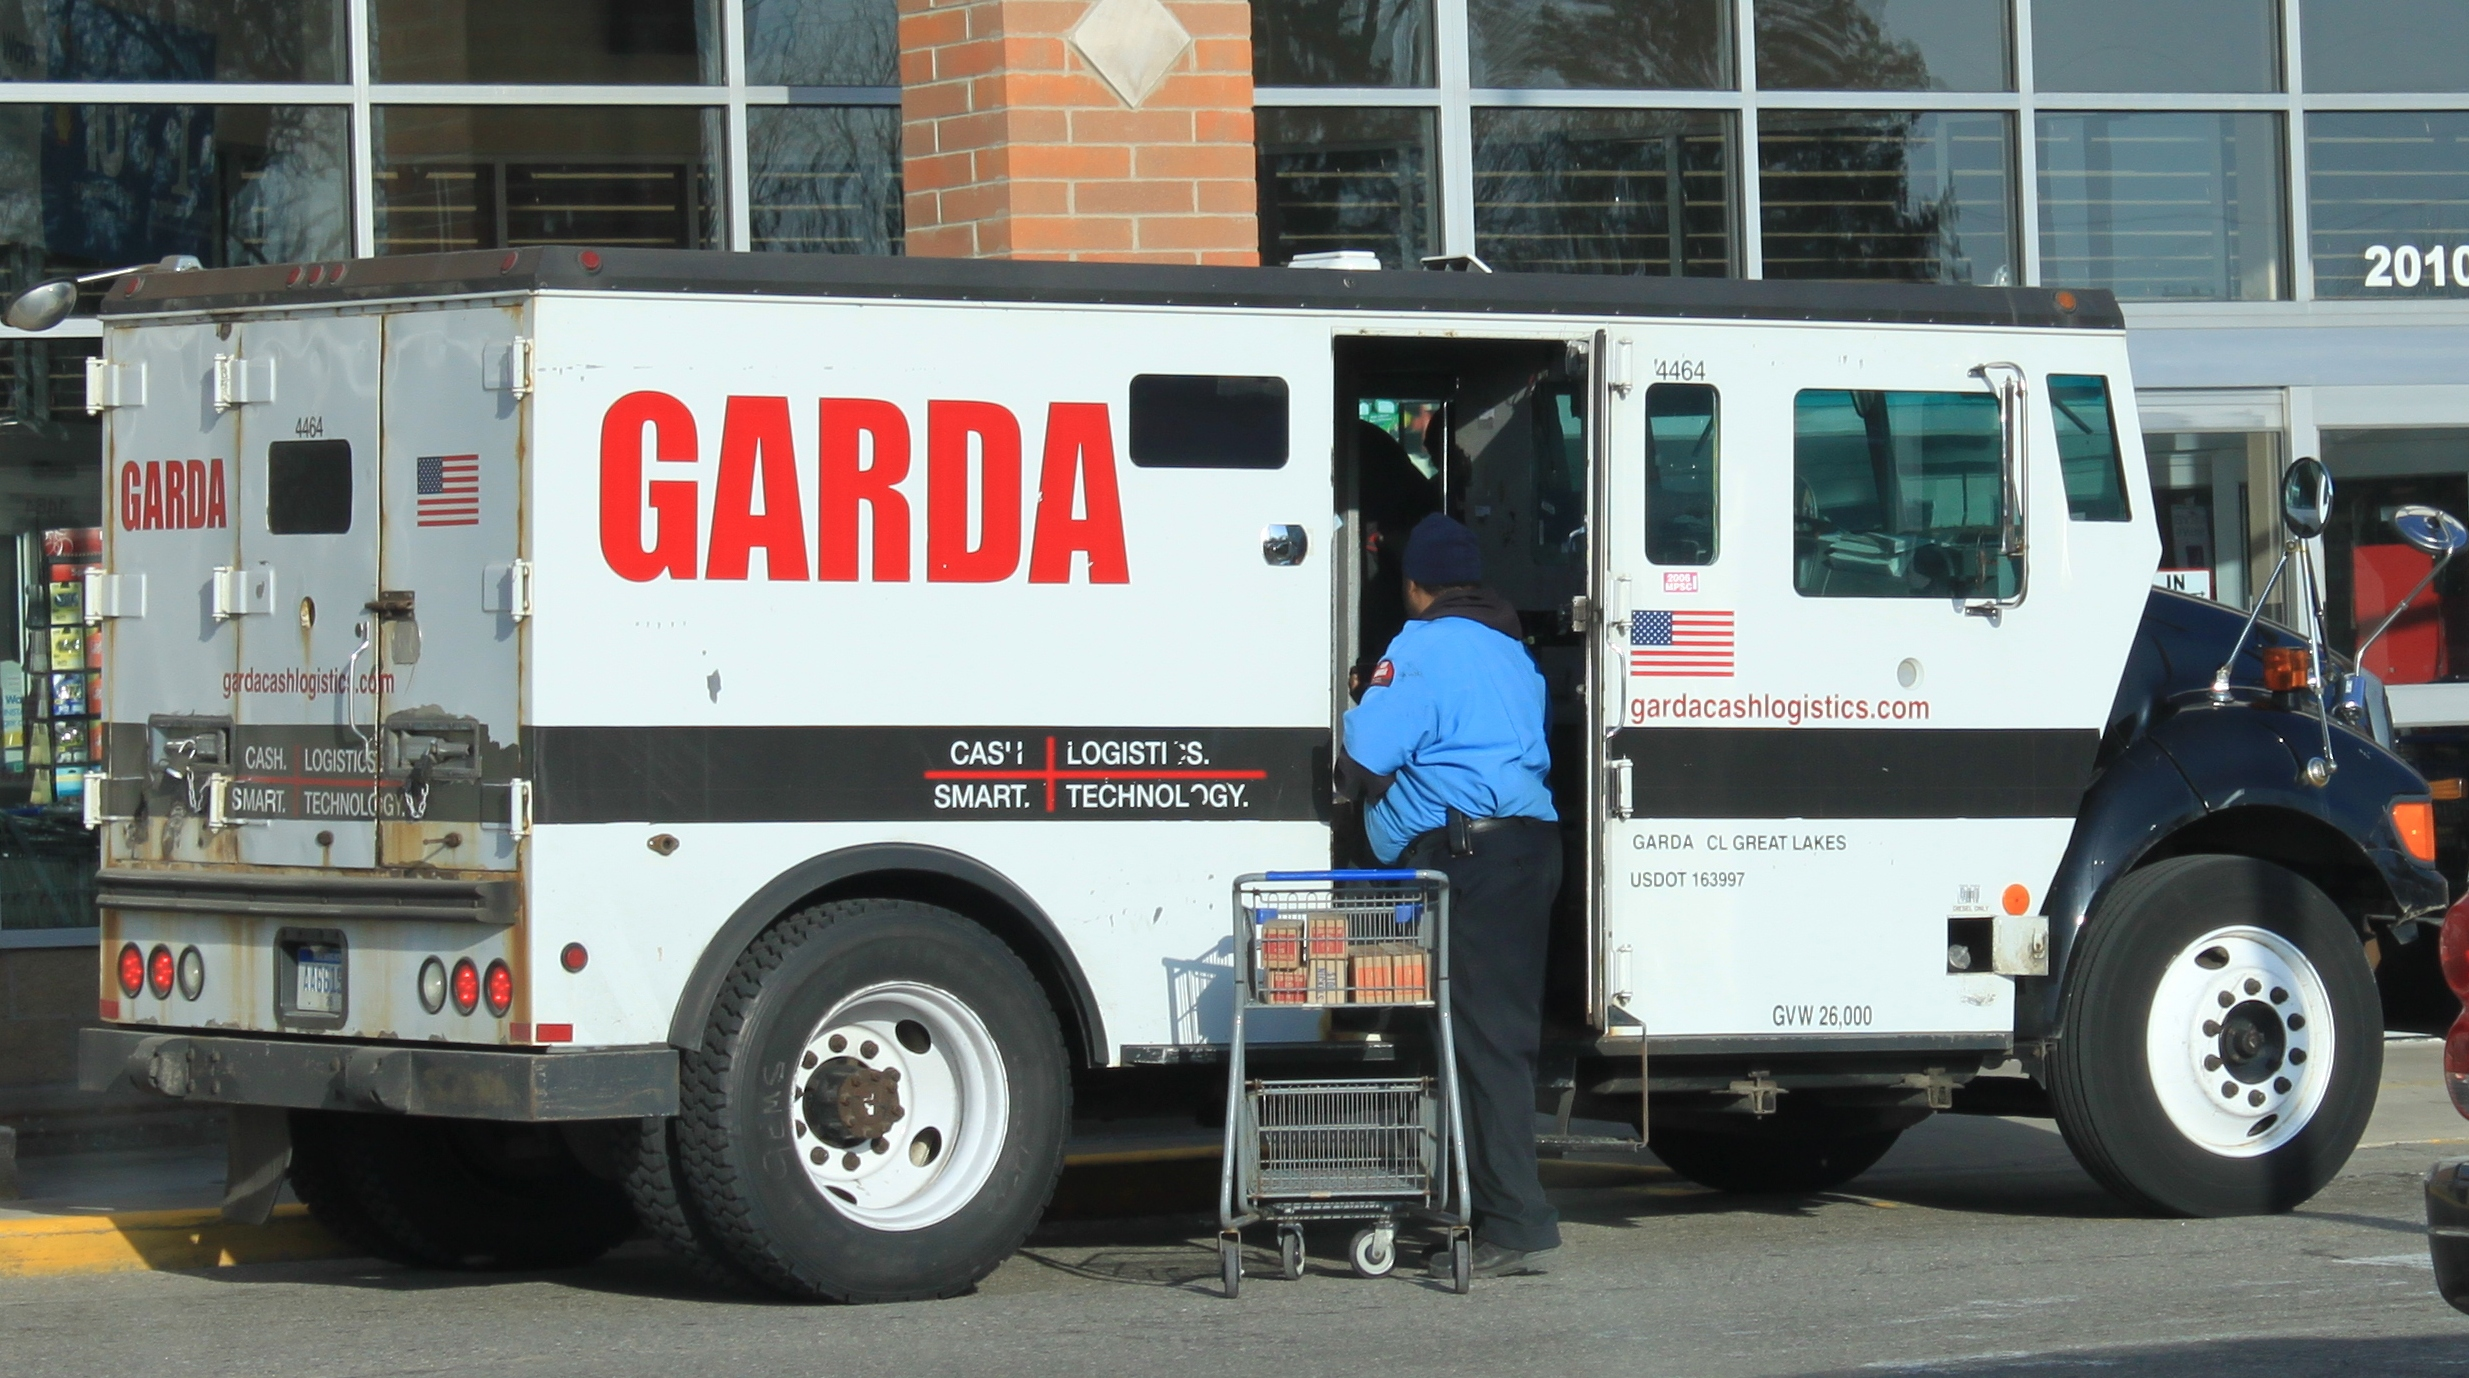 Garda_armored_car_Ypsilanti_Township_Mic